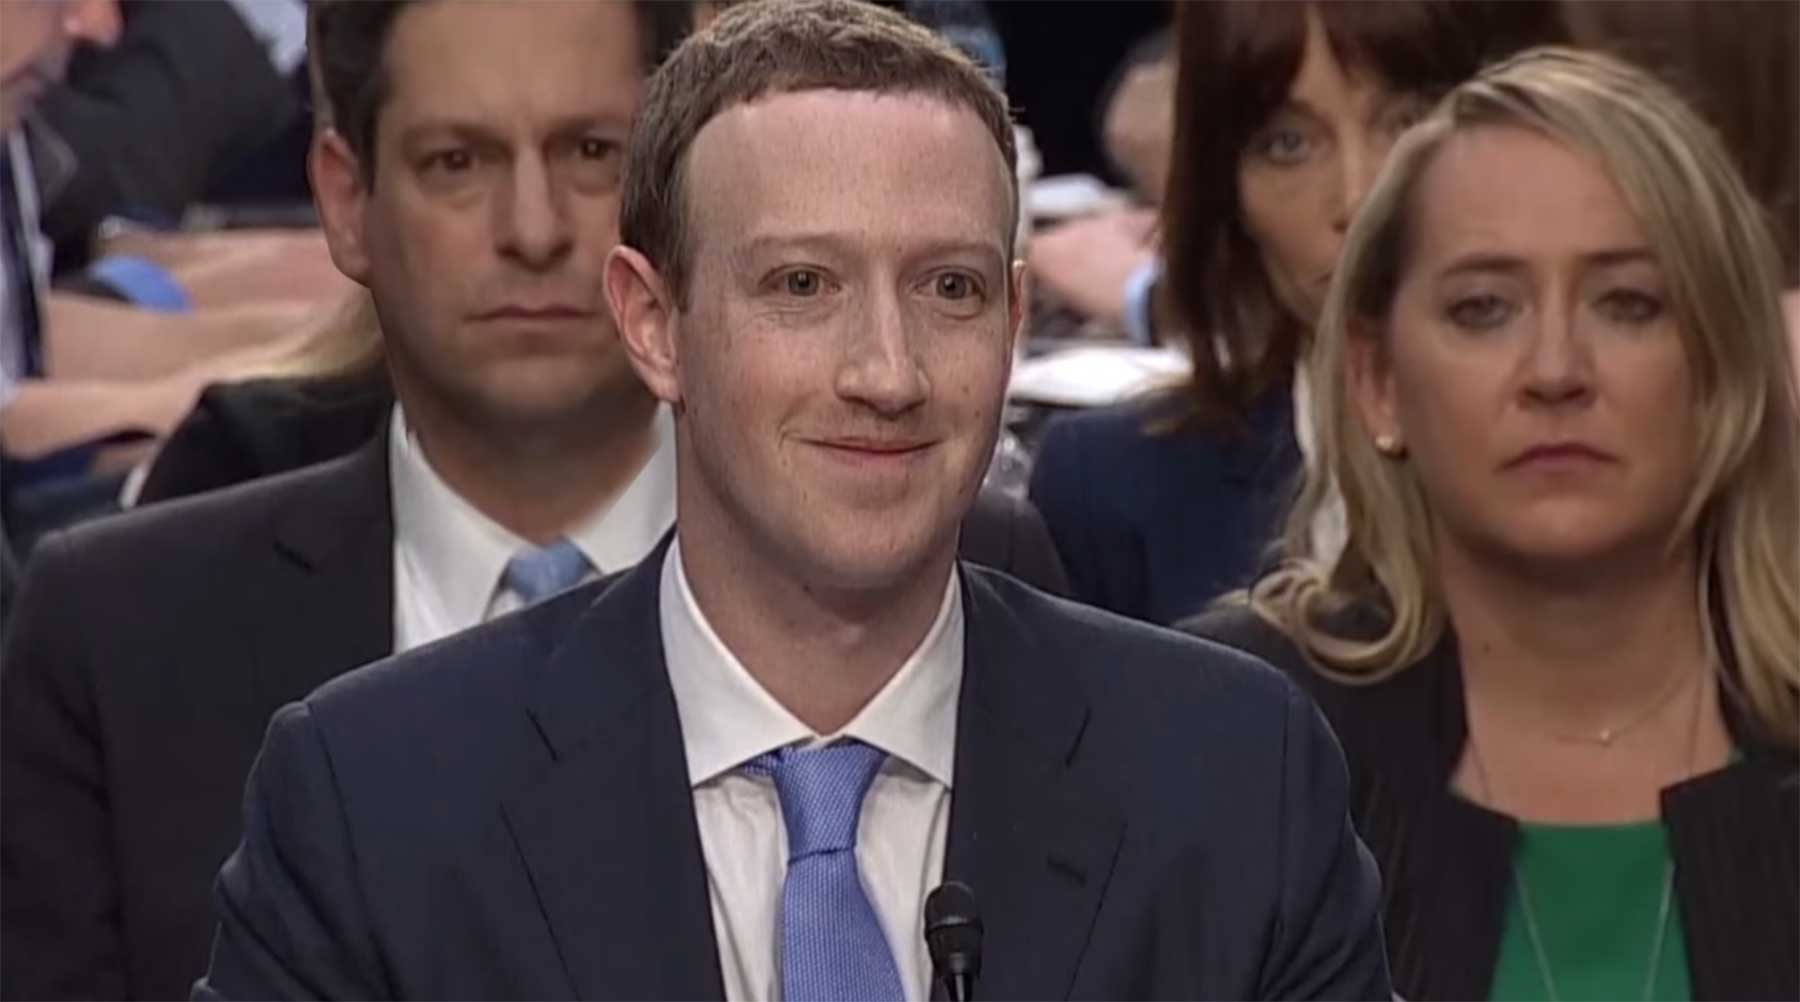 Hätte ein schlechter Lippenleser Mark Zuckerbergs Anhörung beigewohnt a-bad-lip-reading-zuckerberg